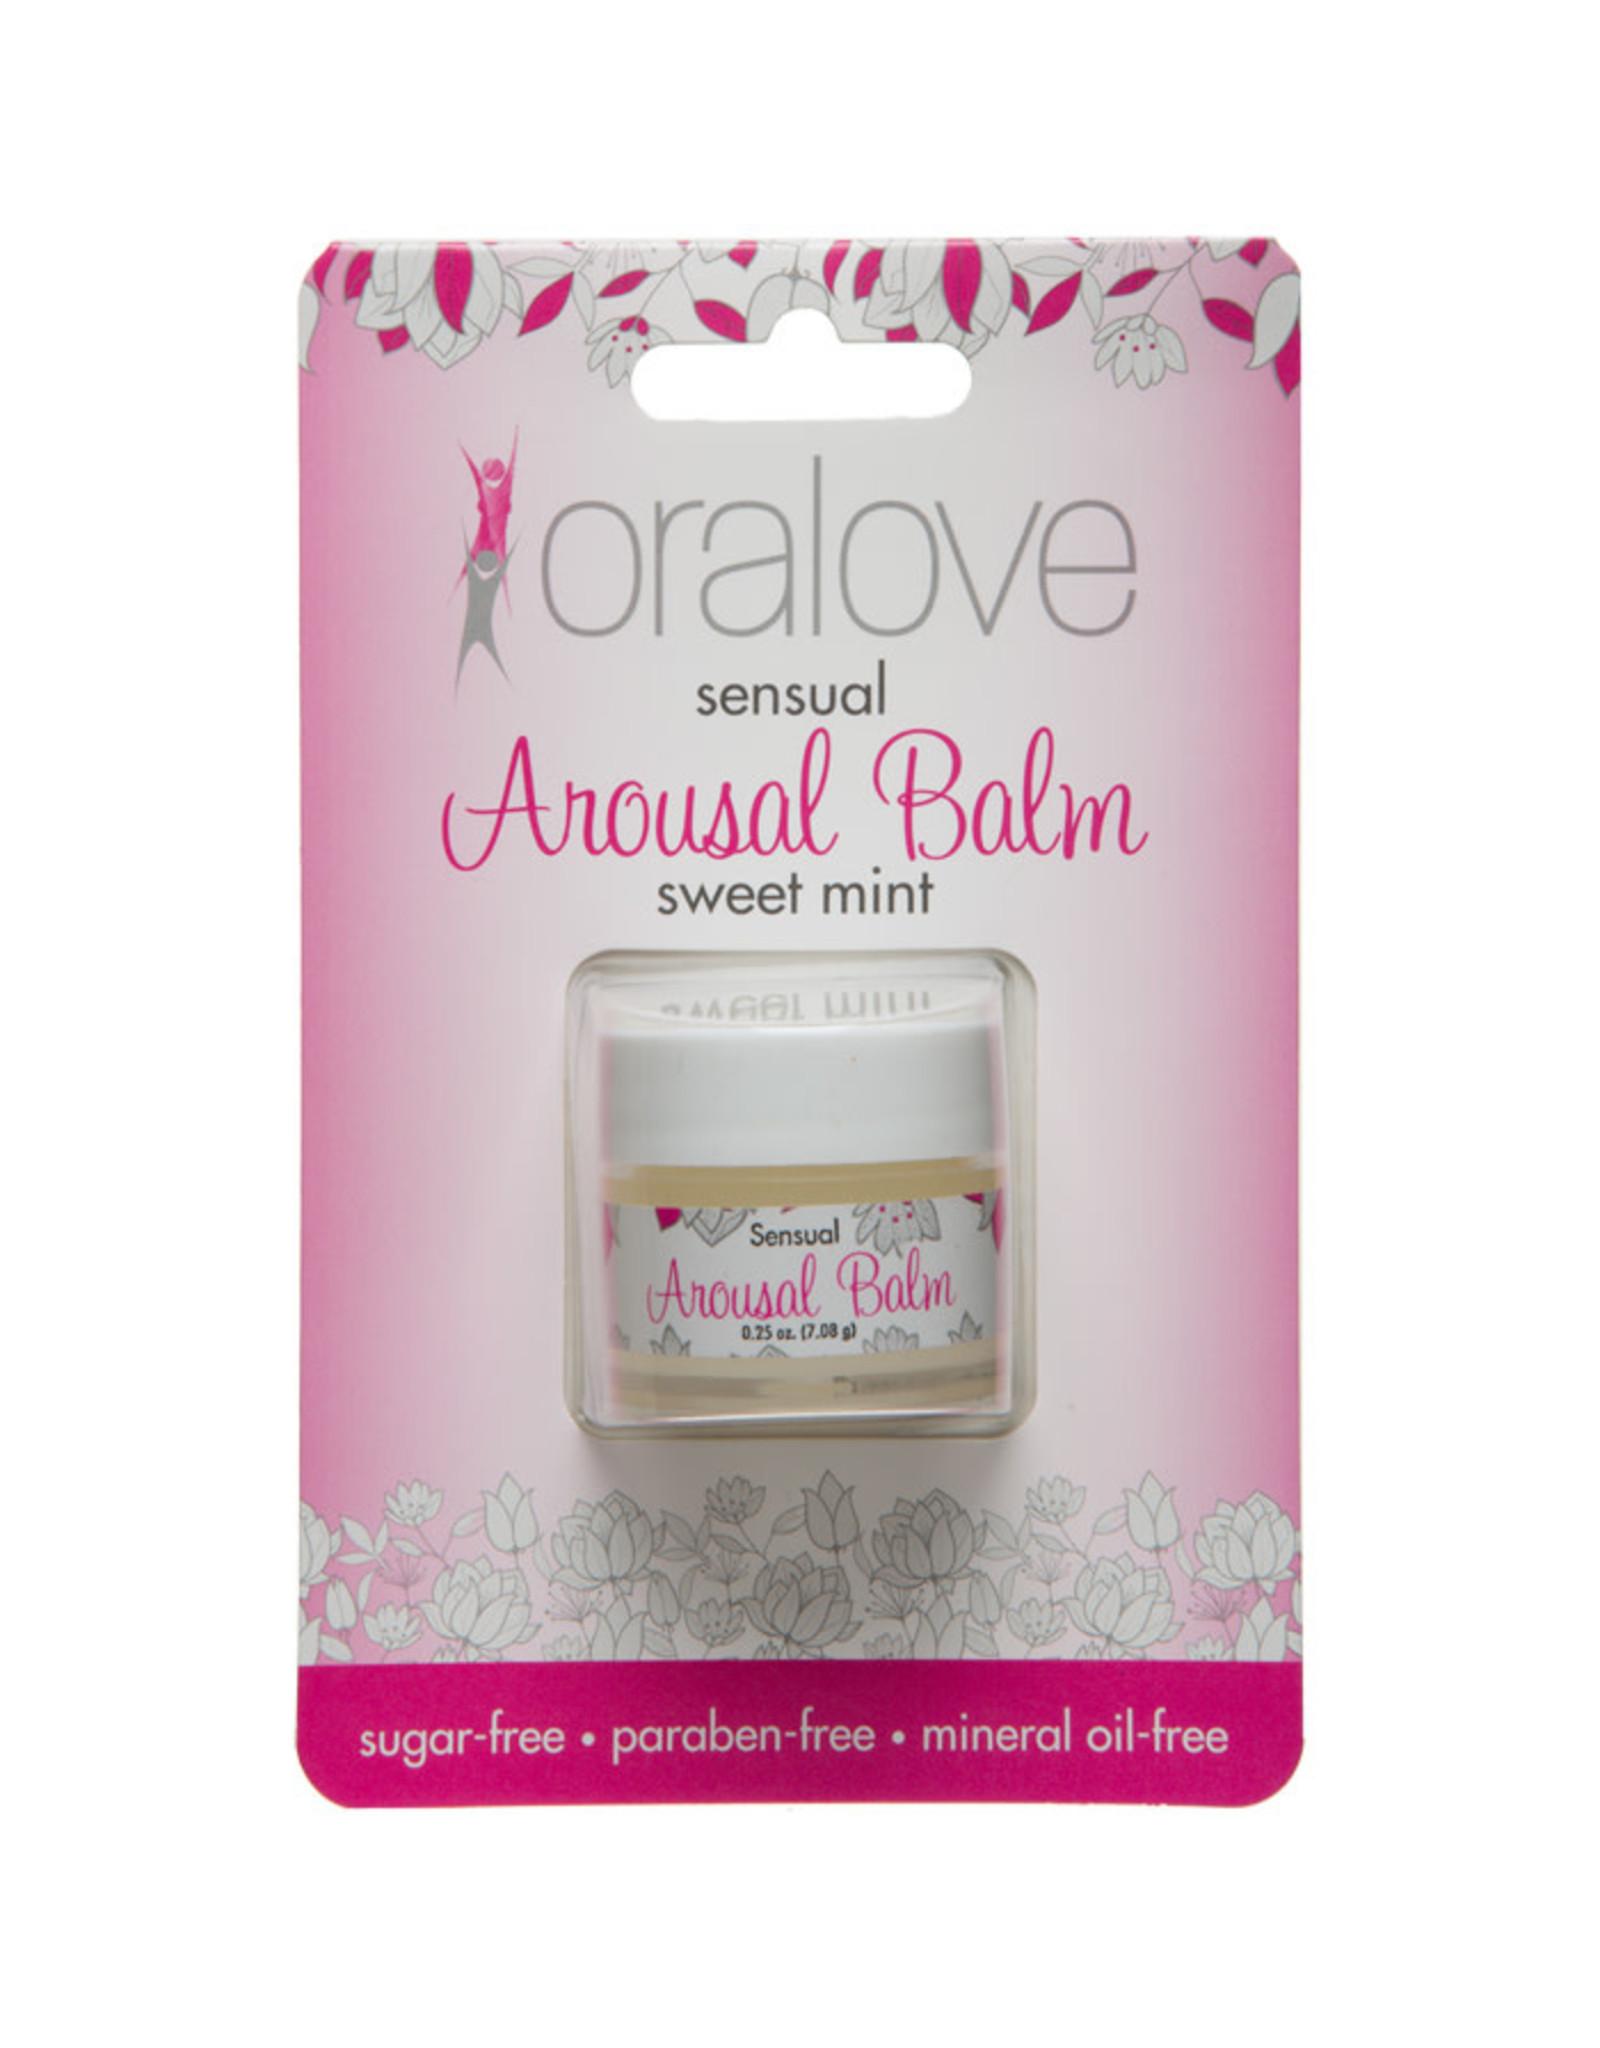 Doc Johnson OraLove - Sensual Arousal Balm - .25 oz